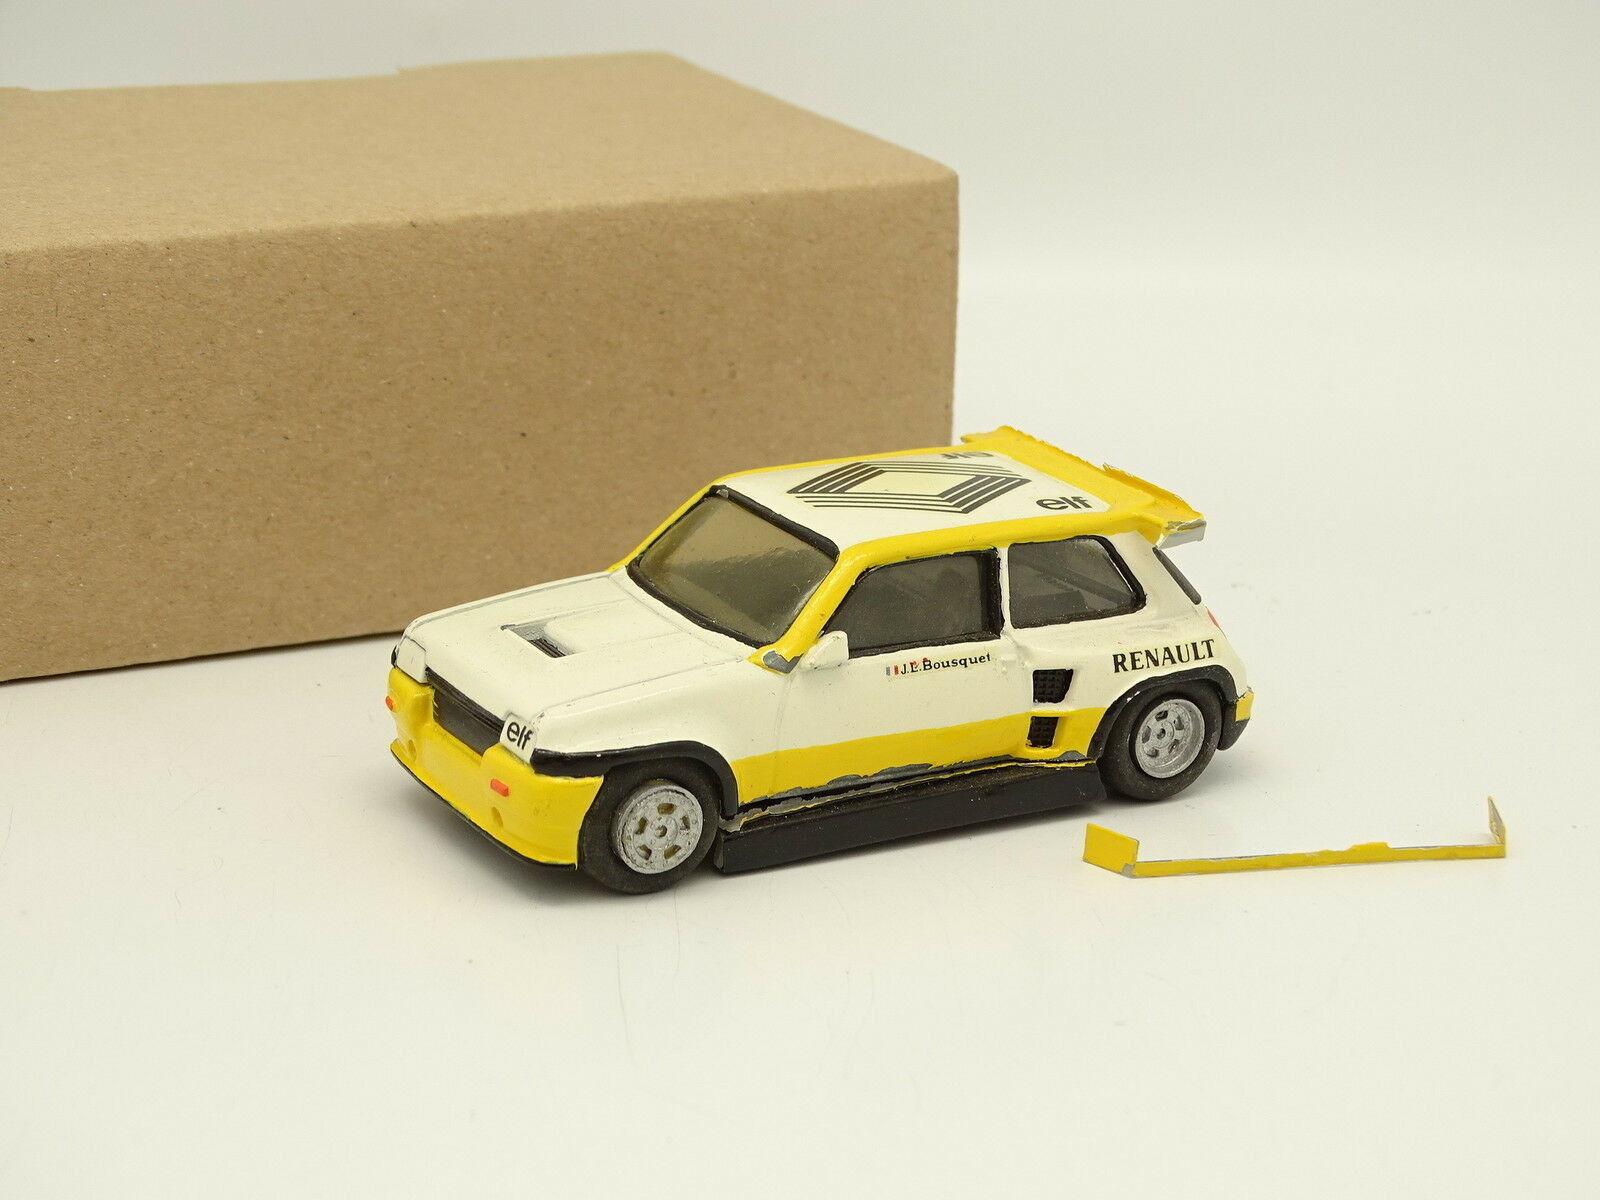 Graphyland Kit montato 1 43 - Renault 5 MAxi Turbo Produzione Bousquet